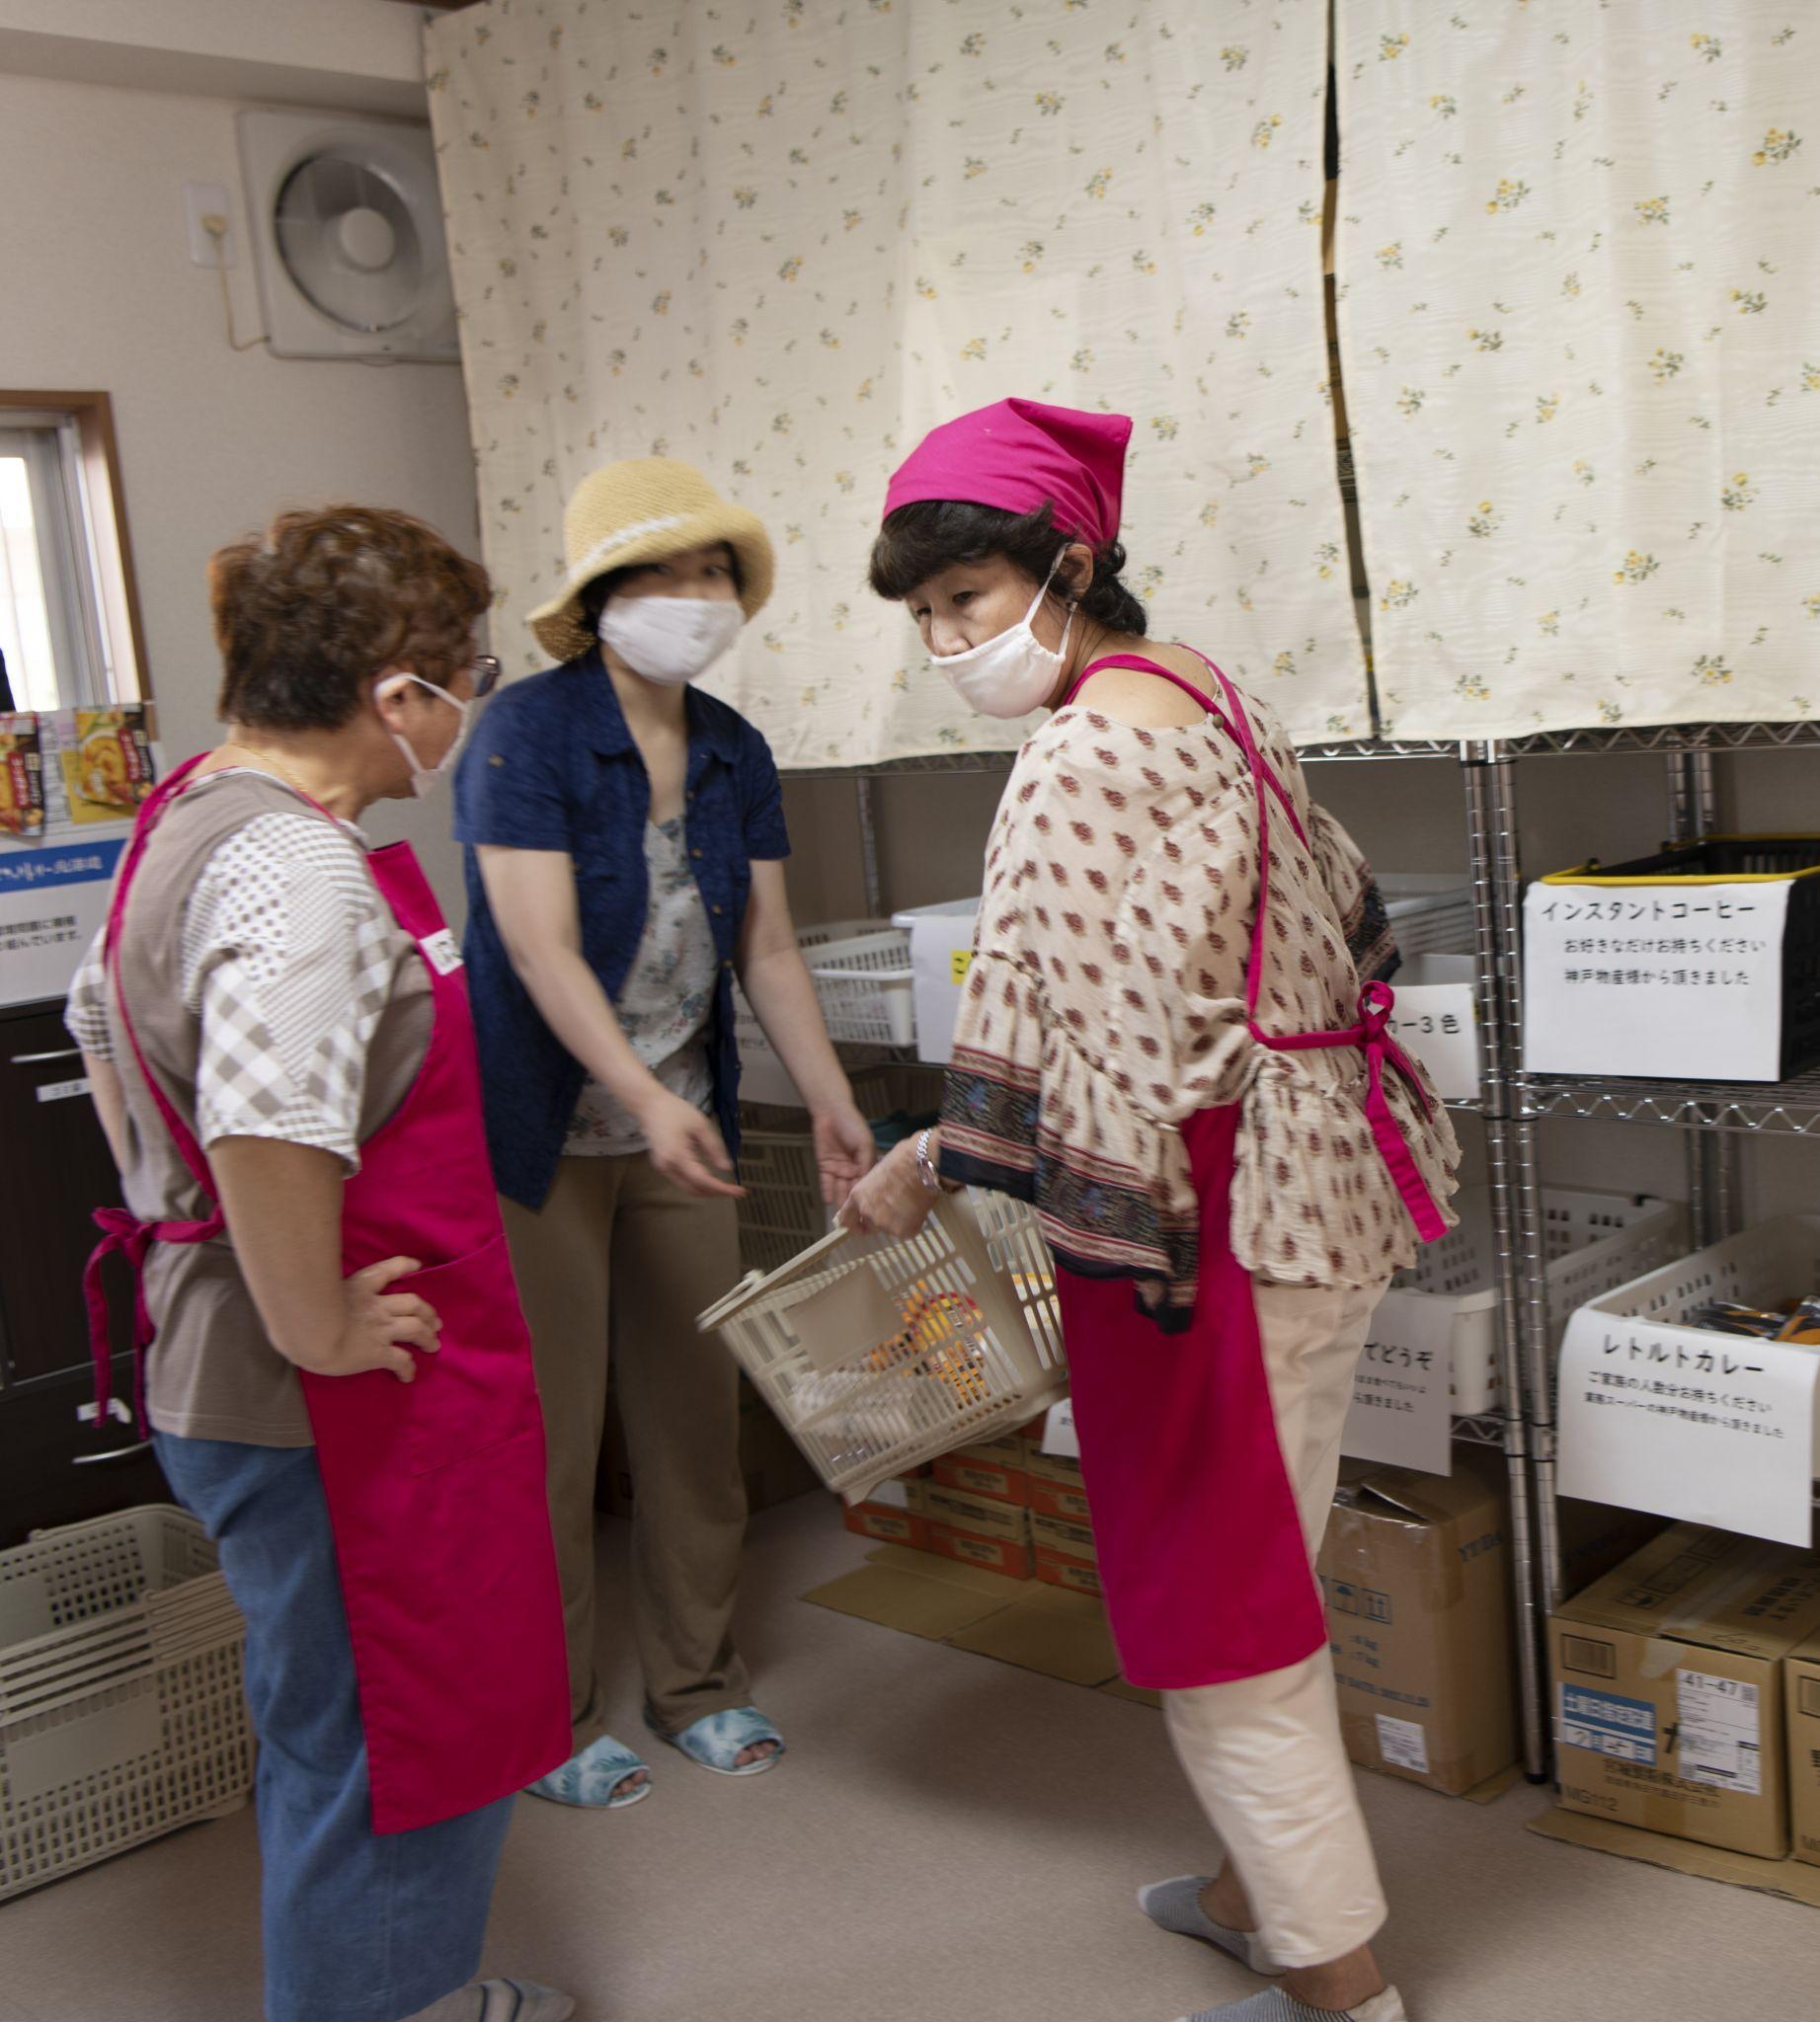 The Hidden Realities of Japan's Single Mothers